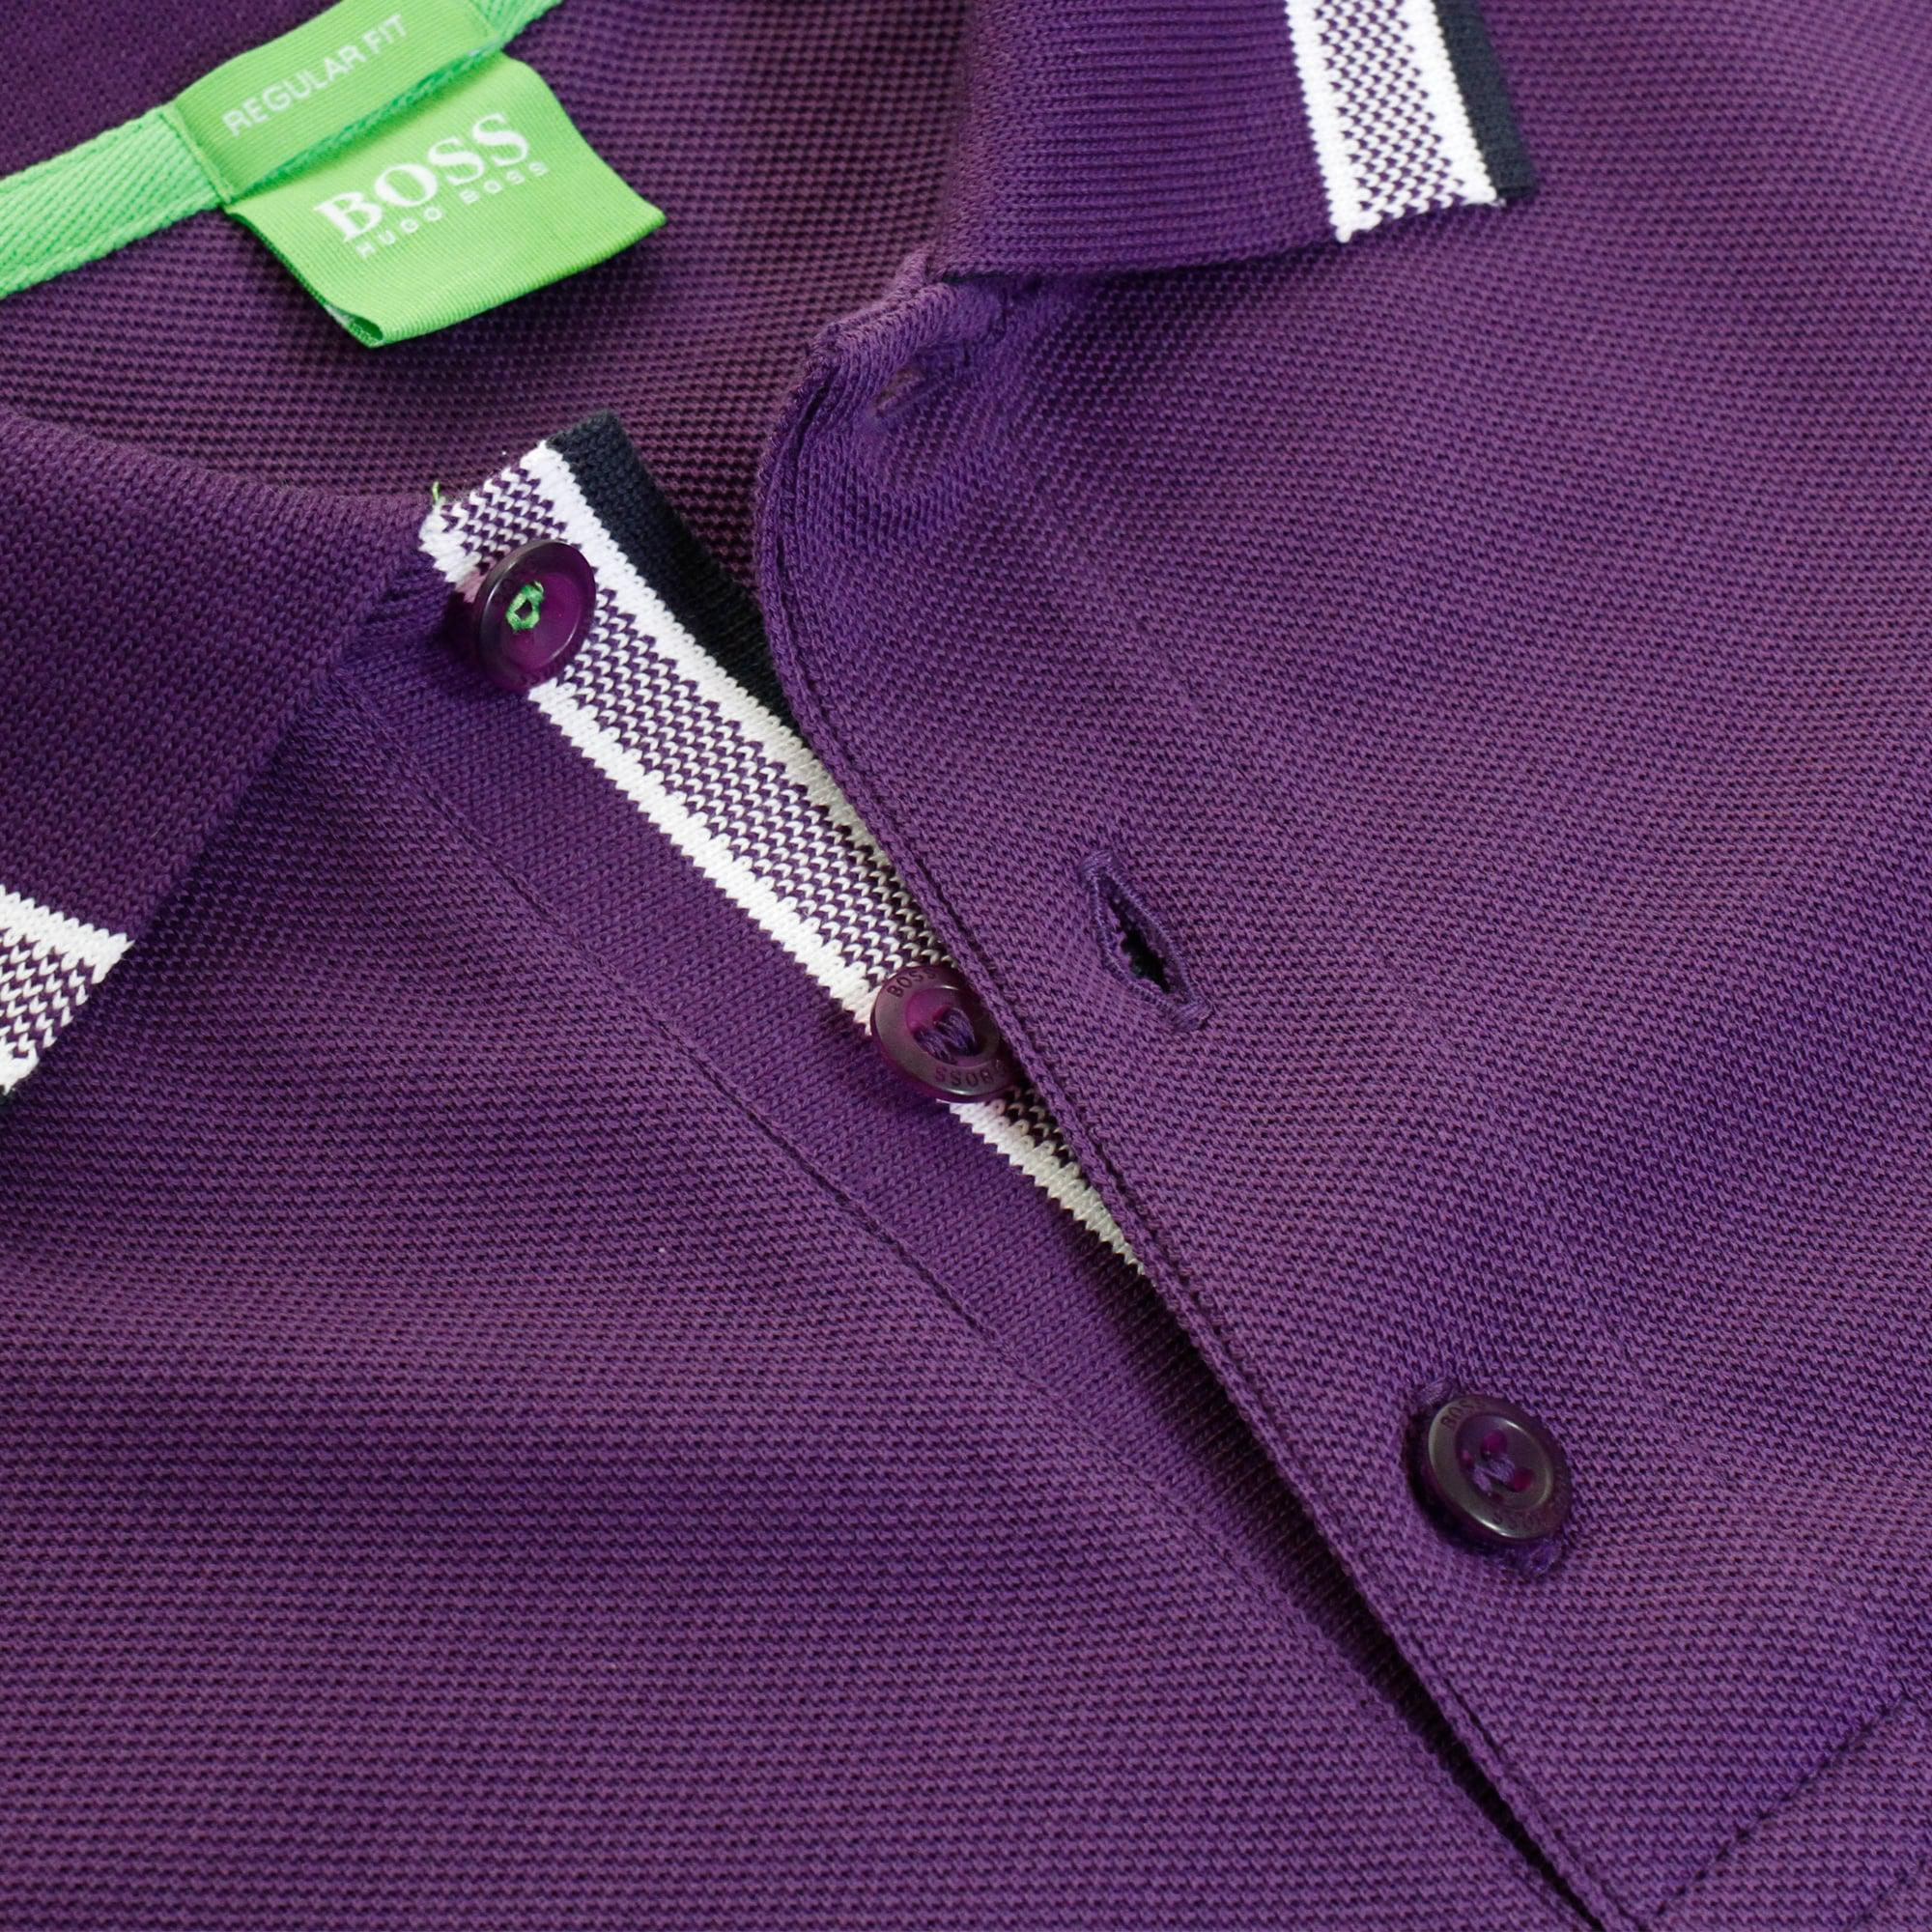 d31f2f988 Lyst - BOSS Green Hugo Paddy Dark Purple Polo Shirt in Purple for Men